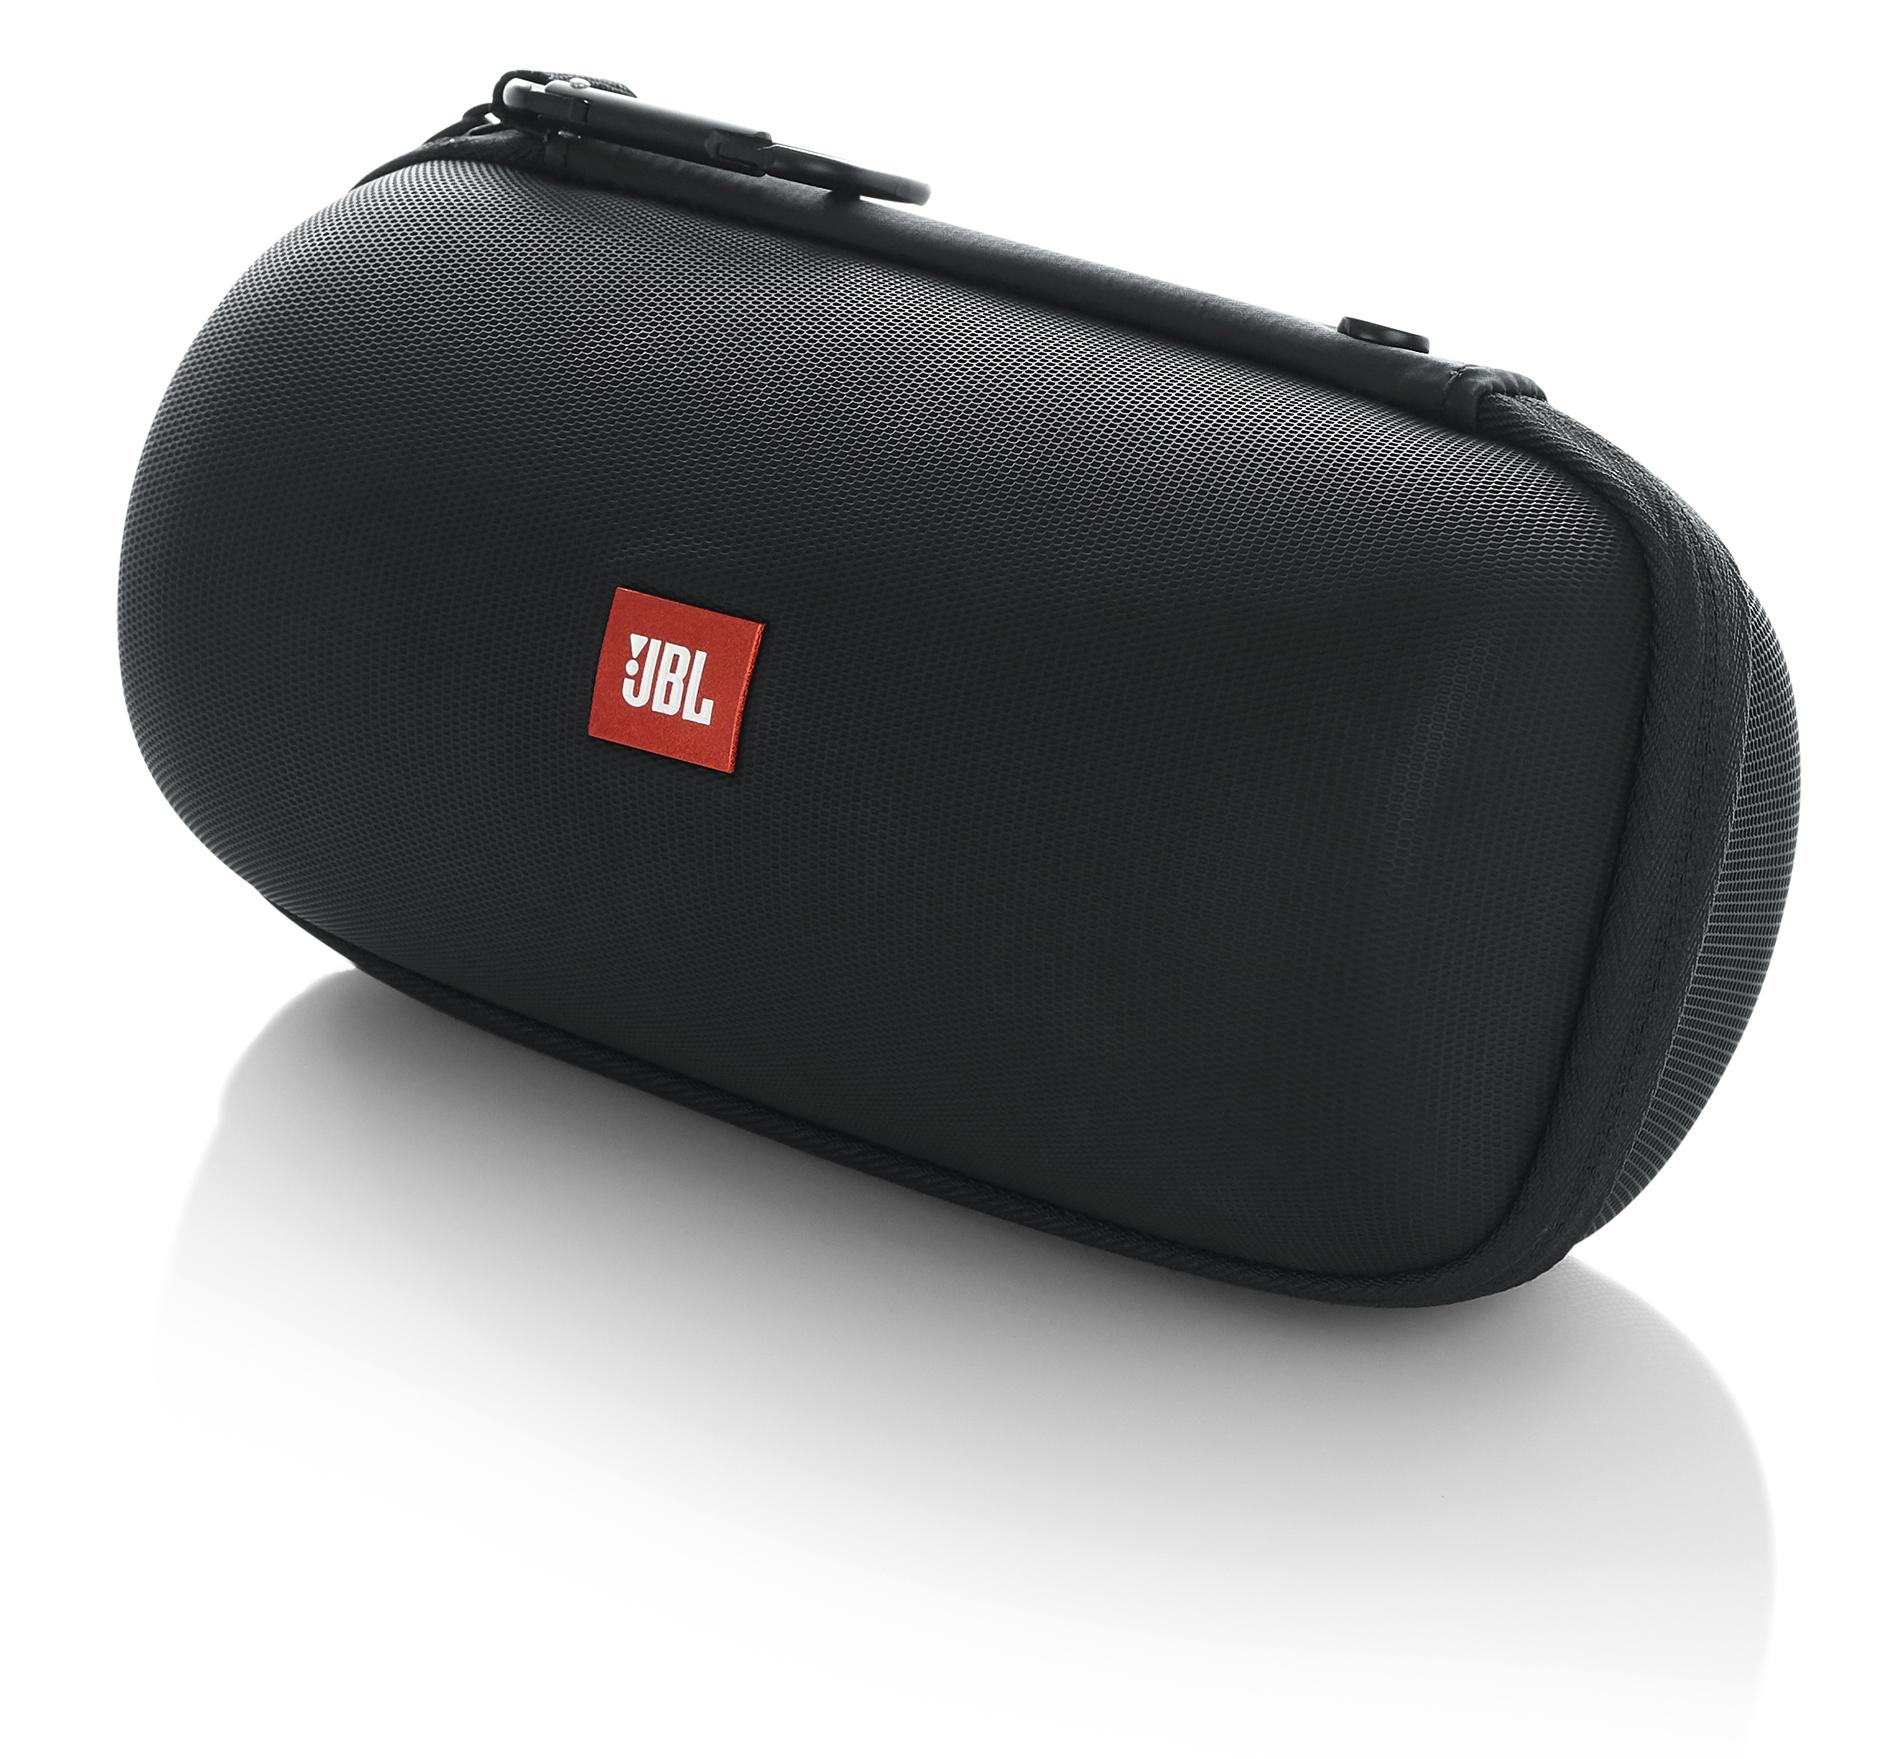 JBL Link 10 Case Exterior